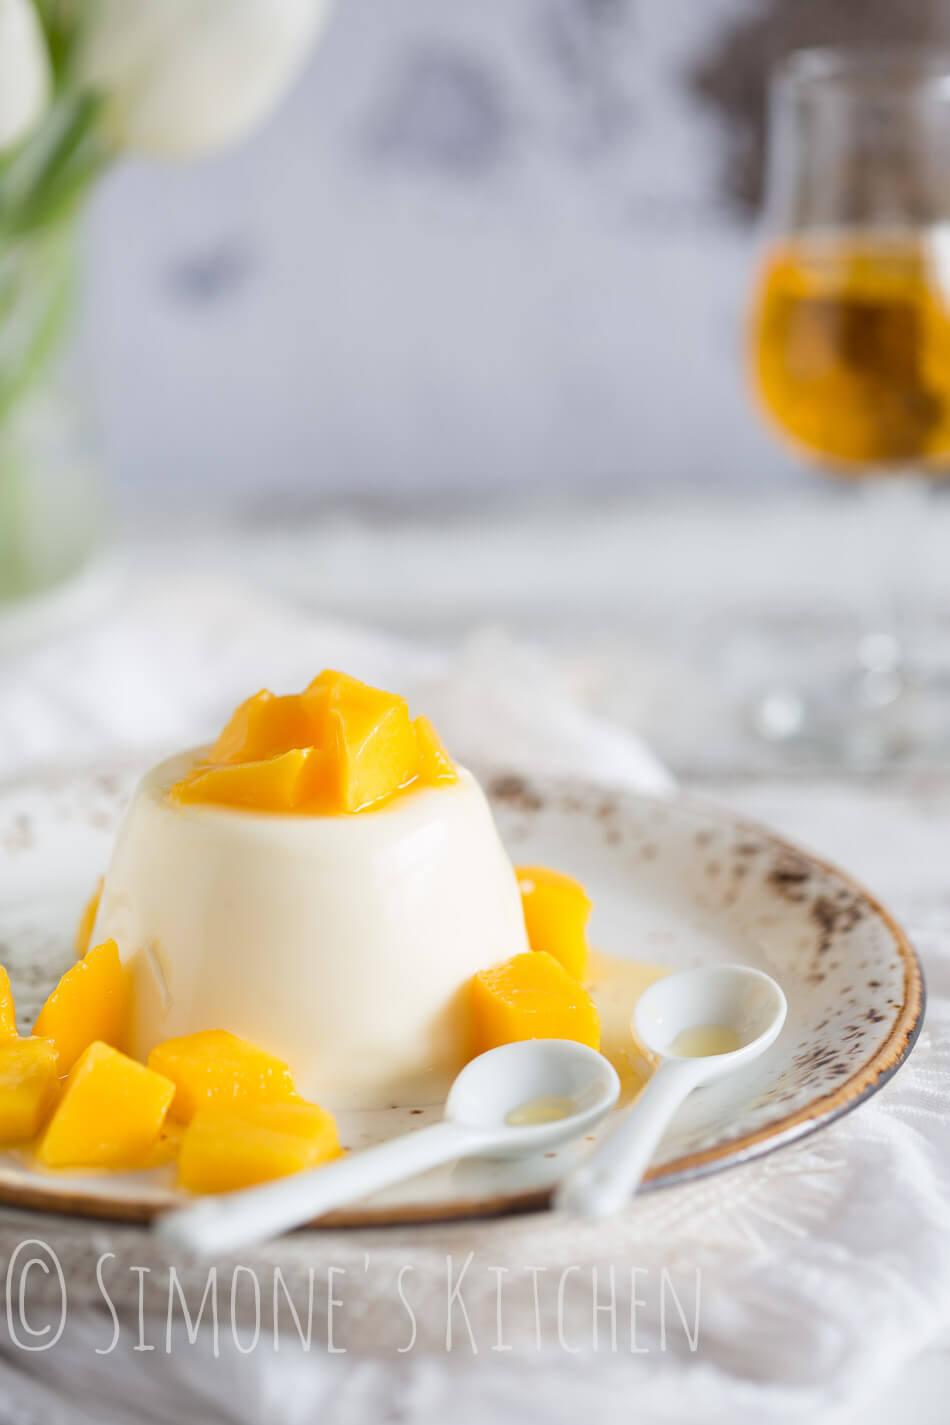 Pannacotta met mango en licor 43 | simoneskitchen.nl